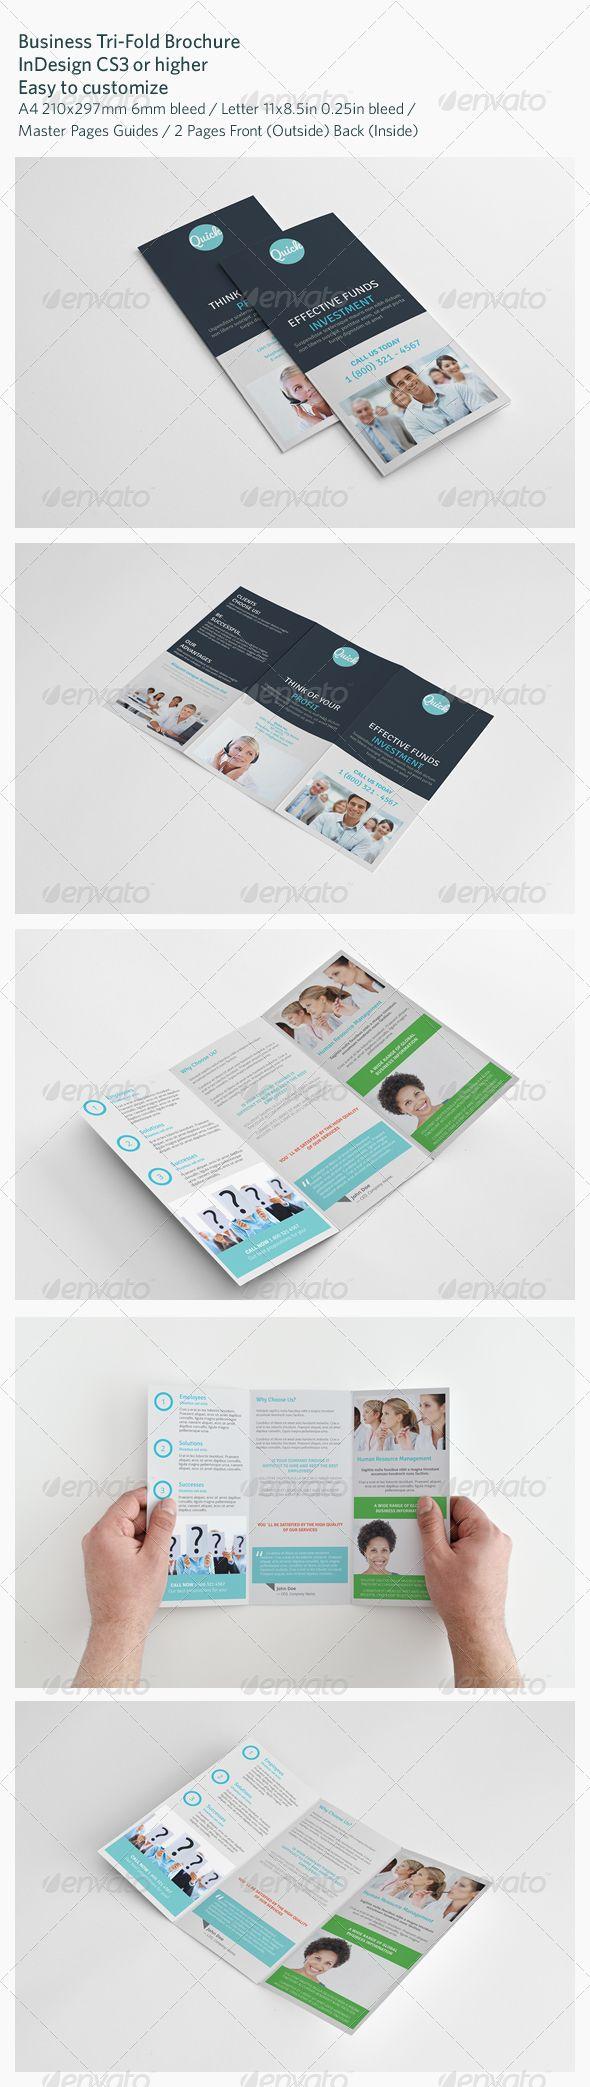 Business Tri Fold Brochure 173 best Print Templates